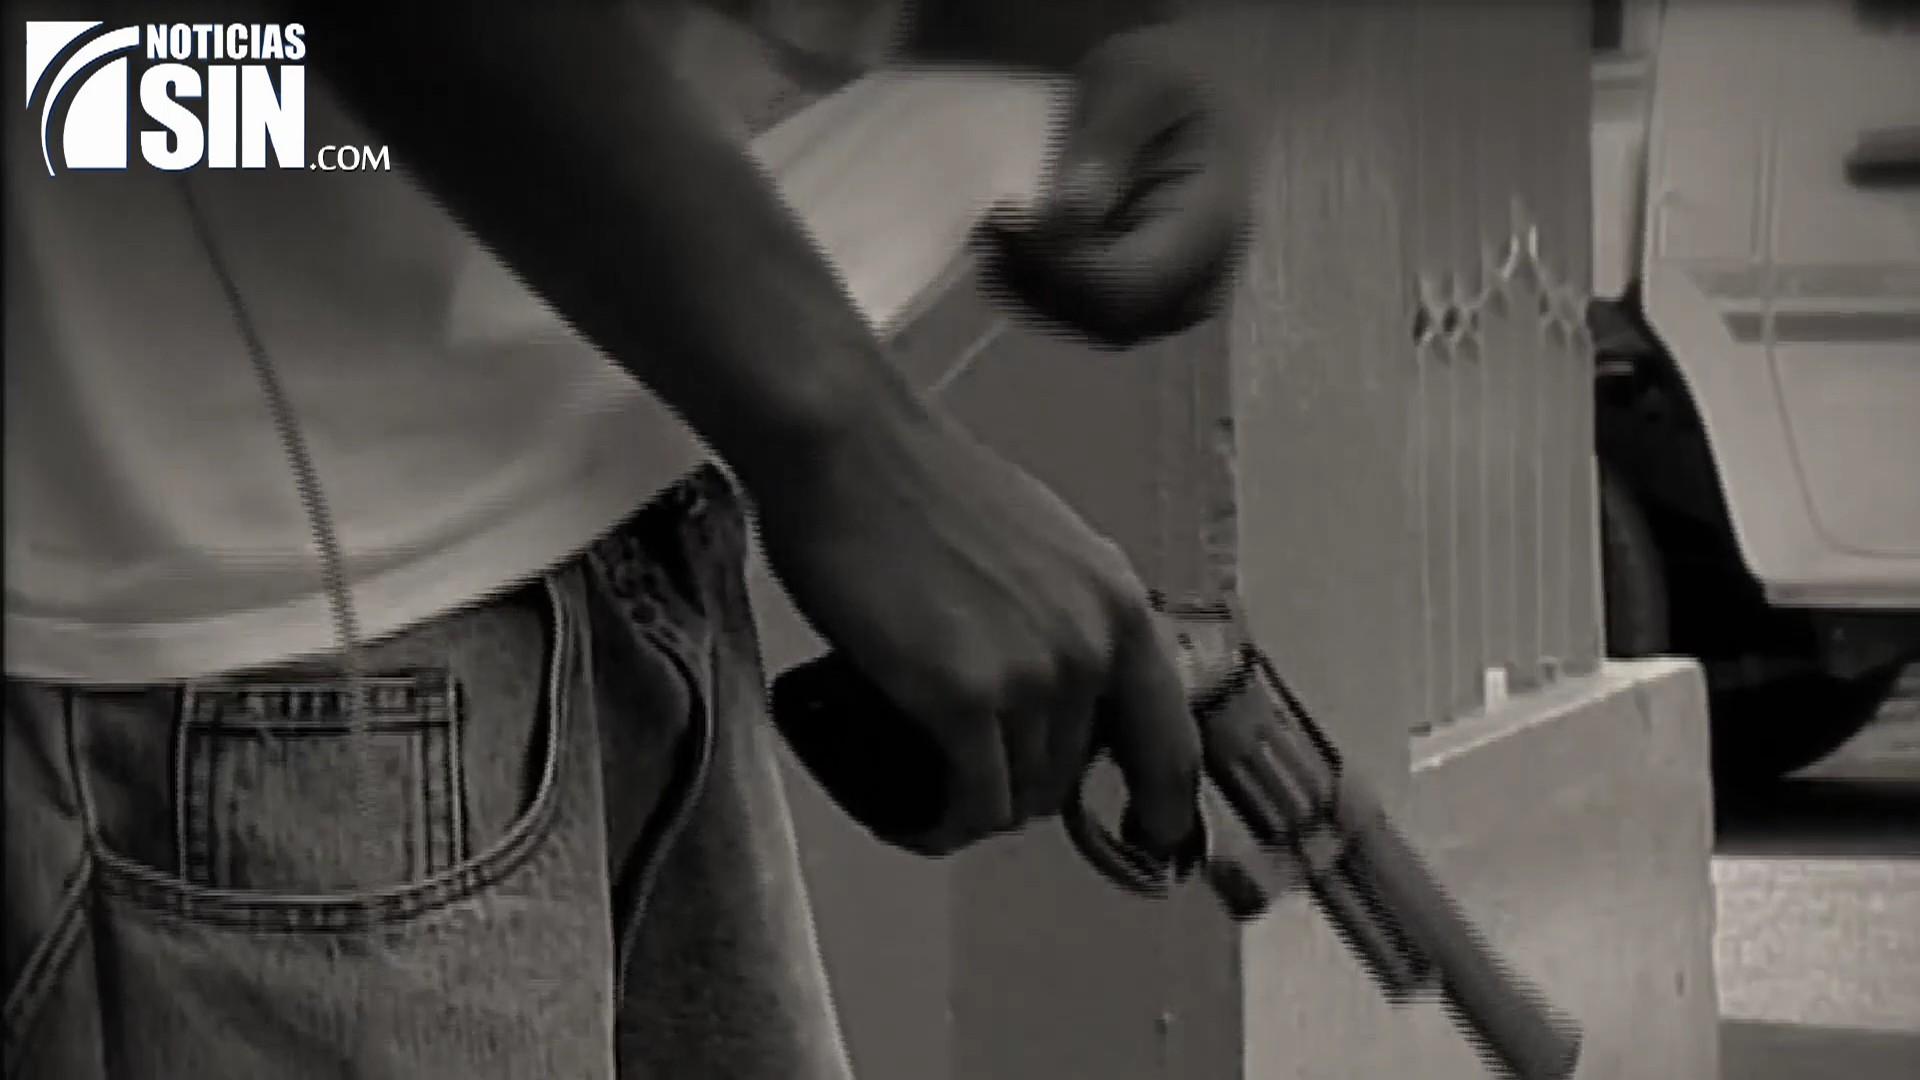 Pandilleros, reclutas del crimen